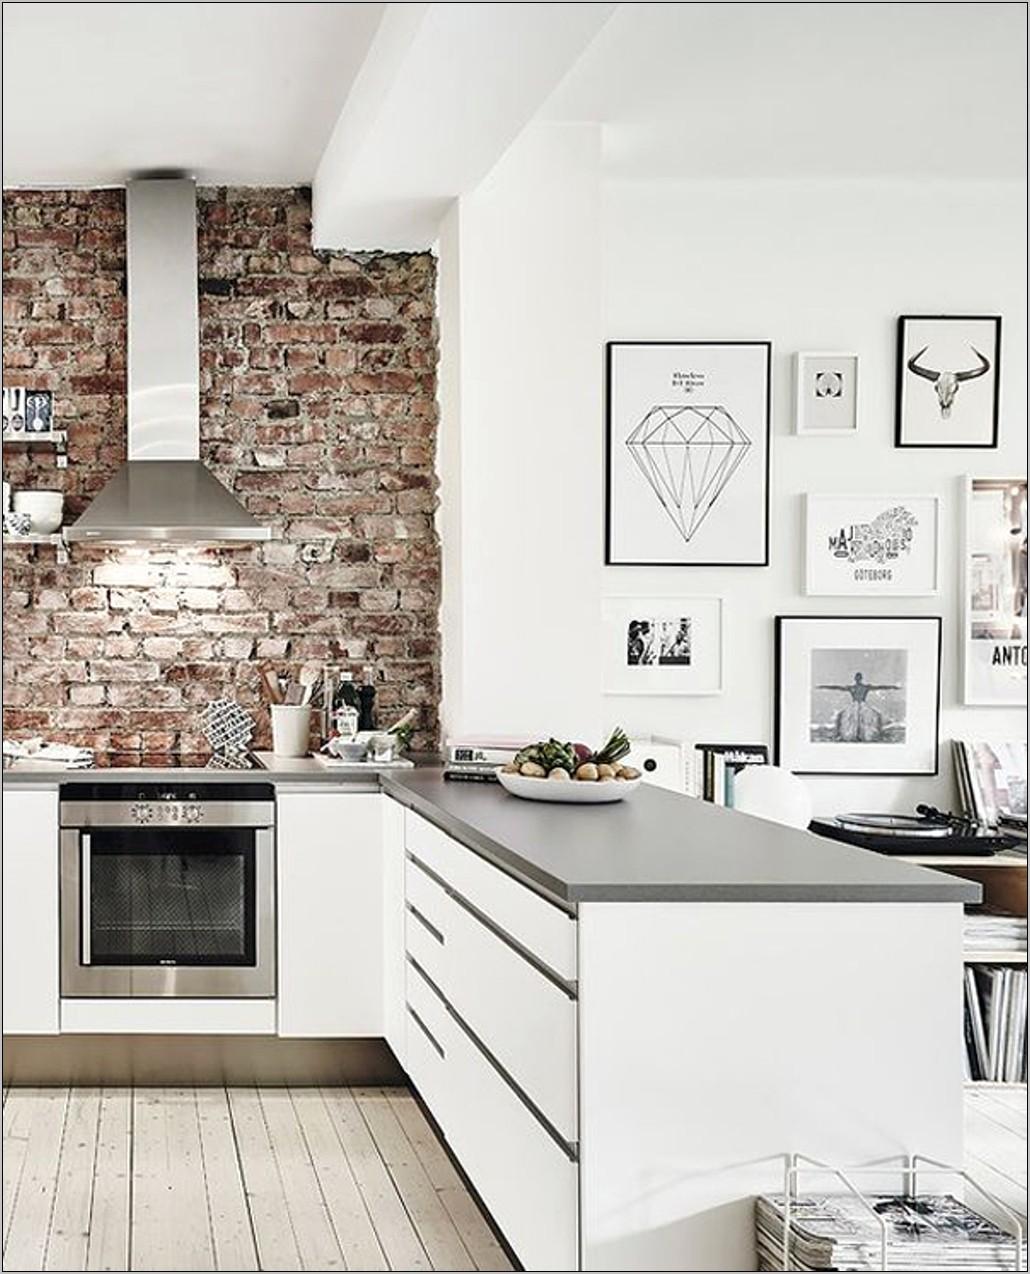 Kitchen Wall Decor In Kitchens